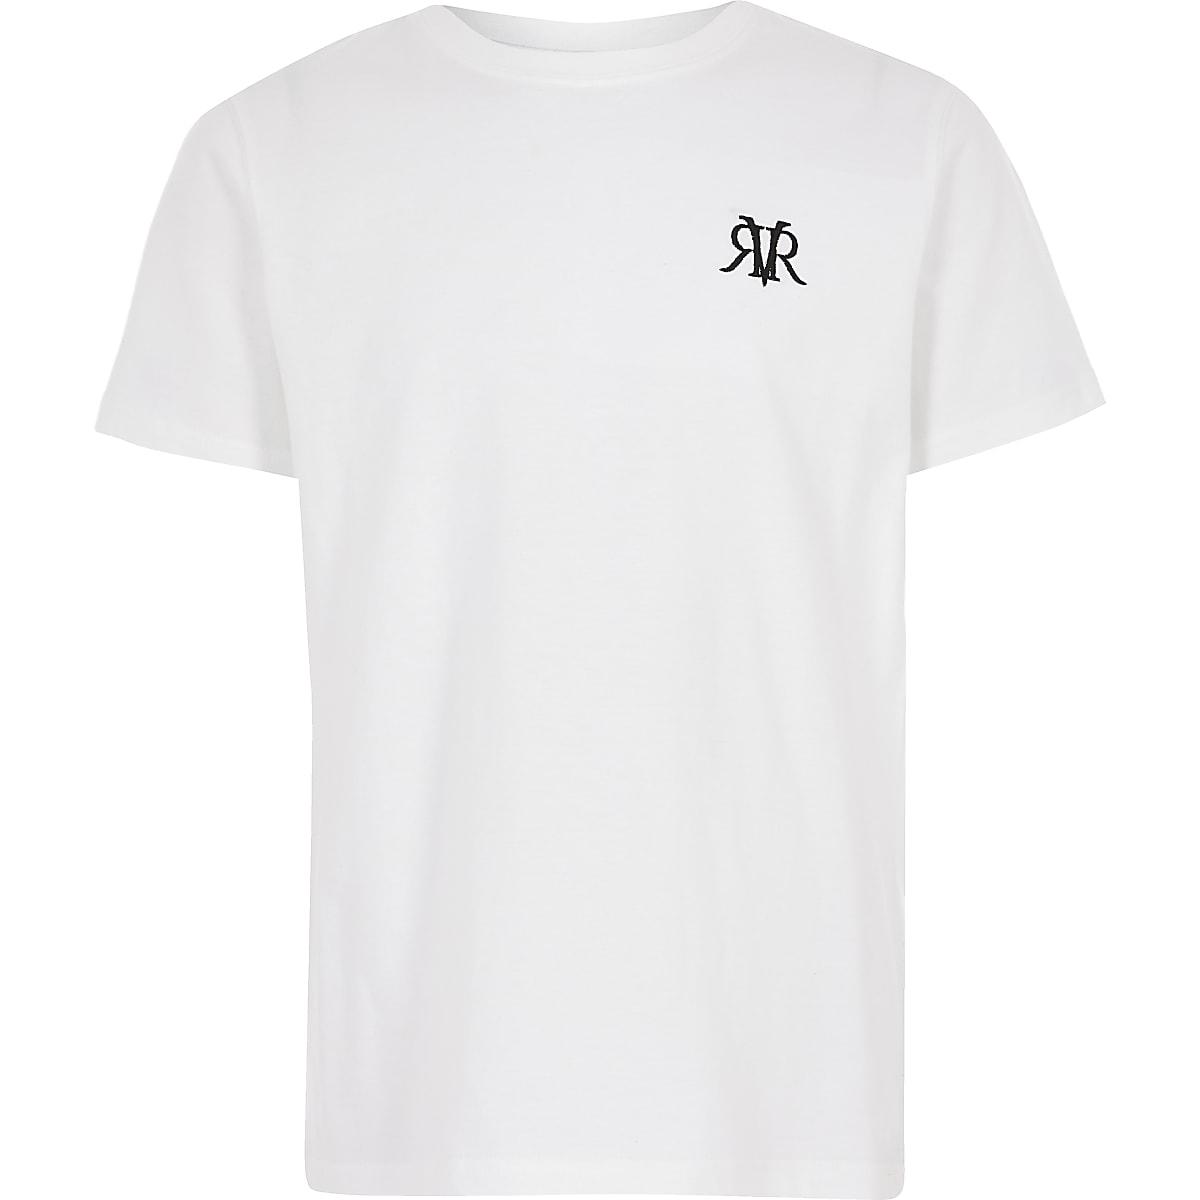 Boys white RI T-shirt